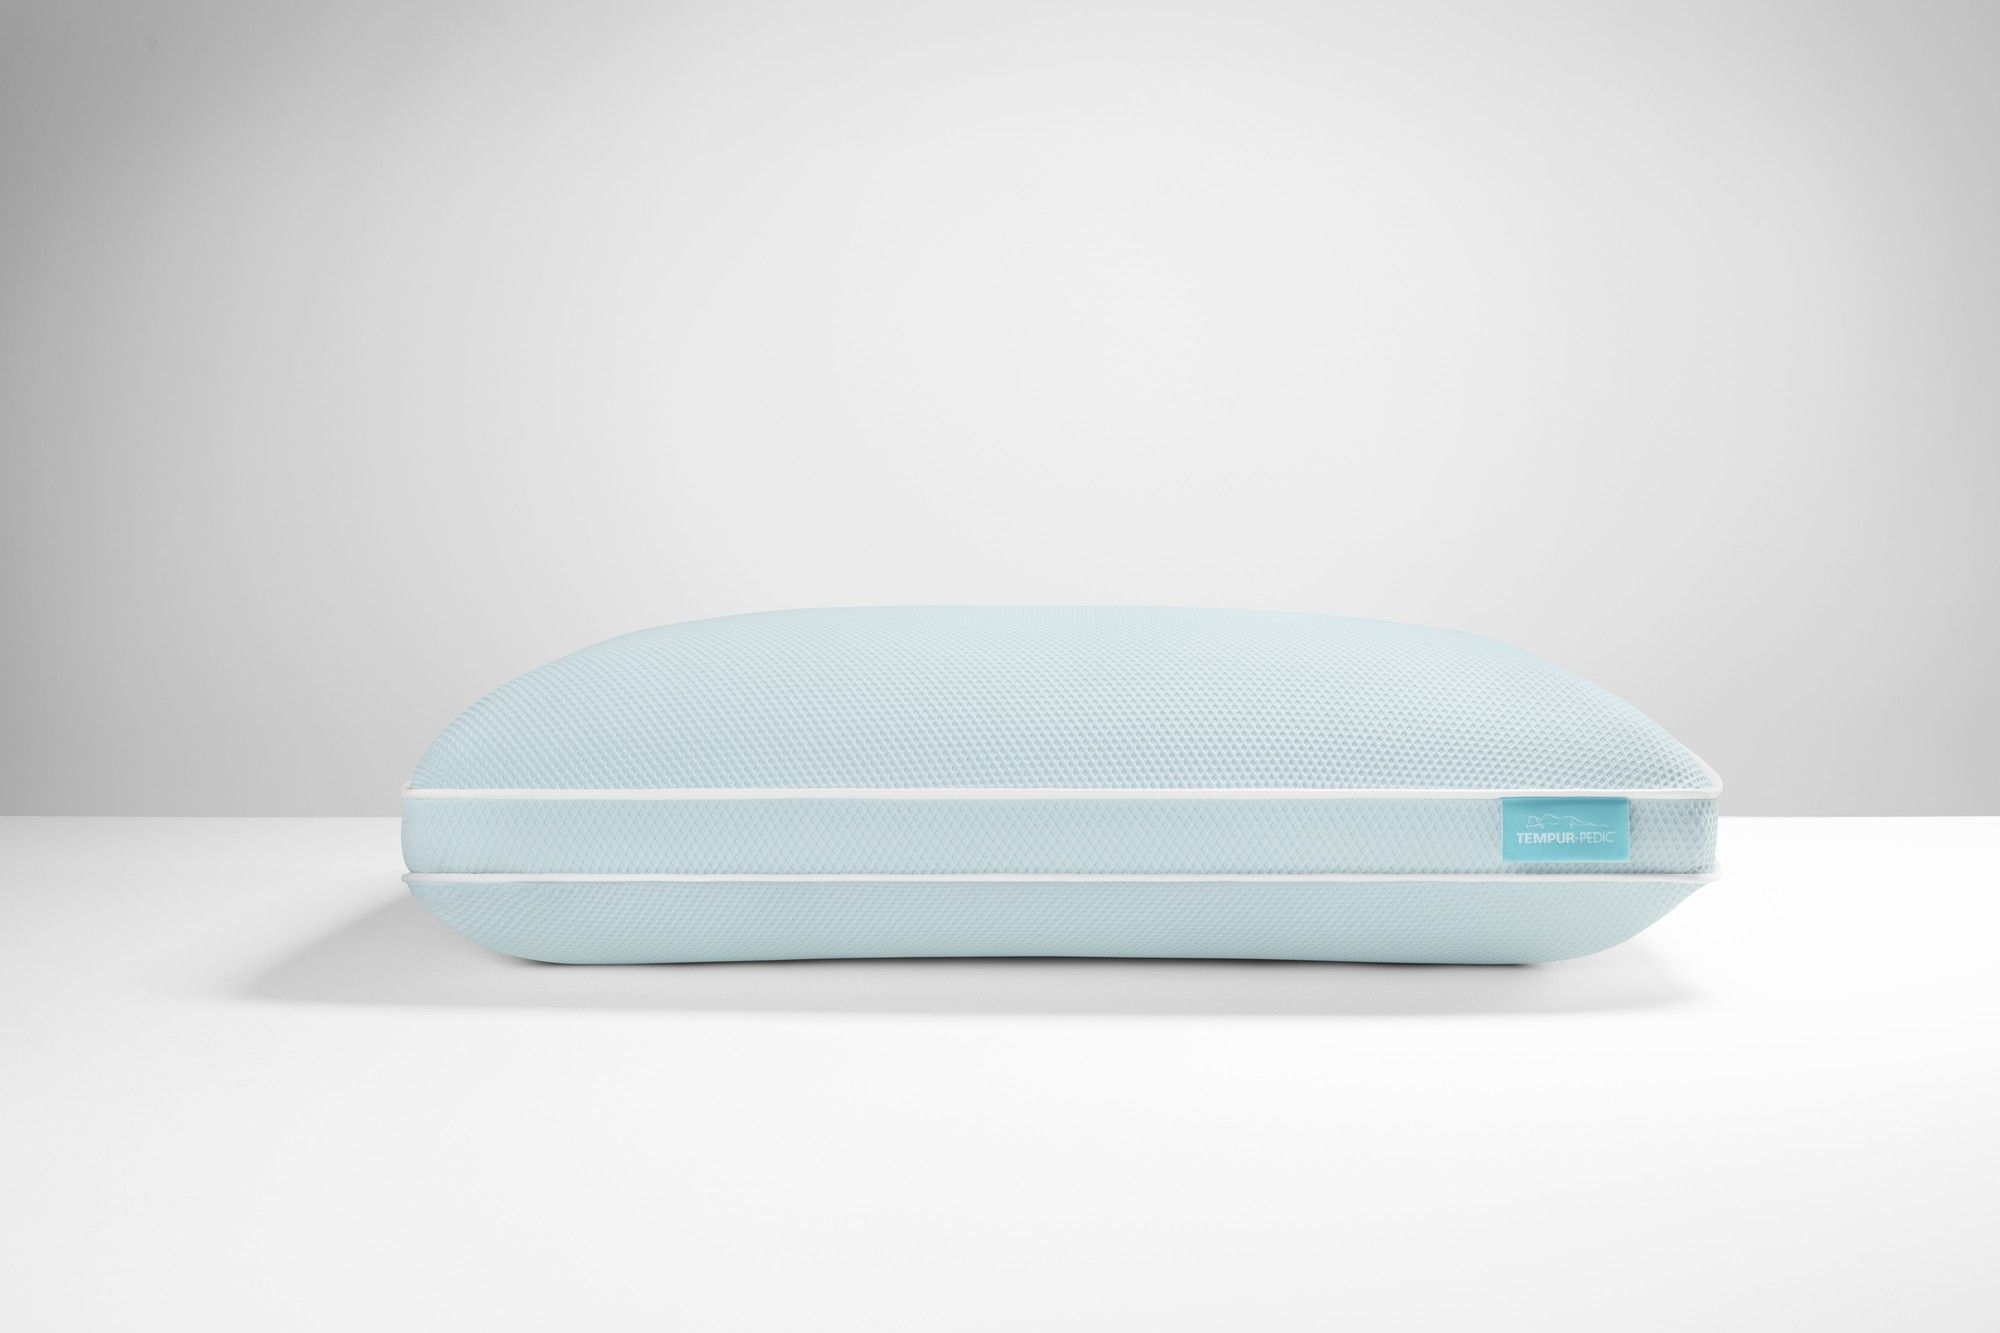 Tempur Cloud Cooling Pro Pillow Tempur Pedic Tempurpedic Best Pillow Pillows